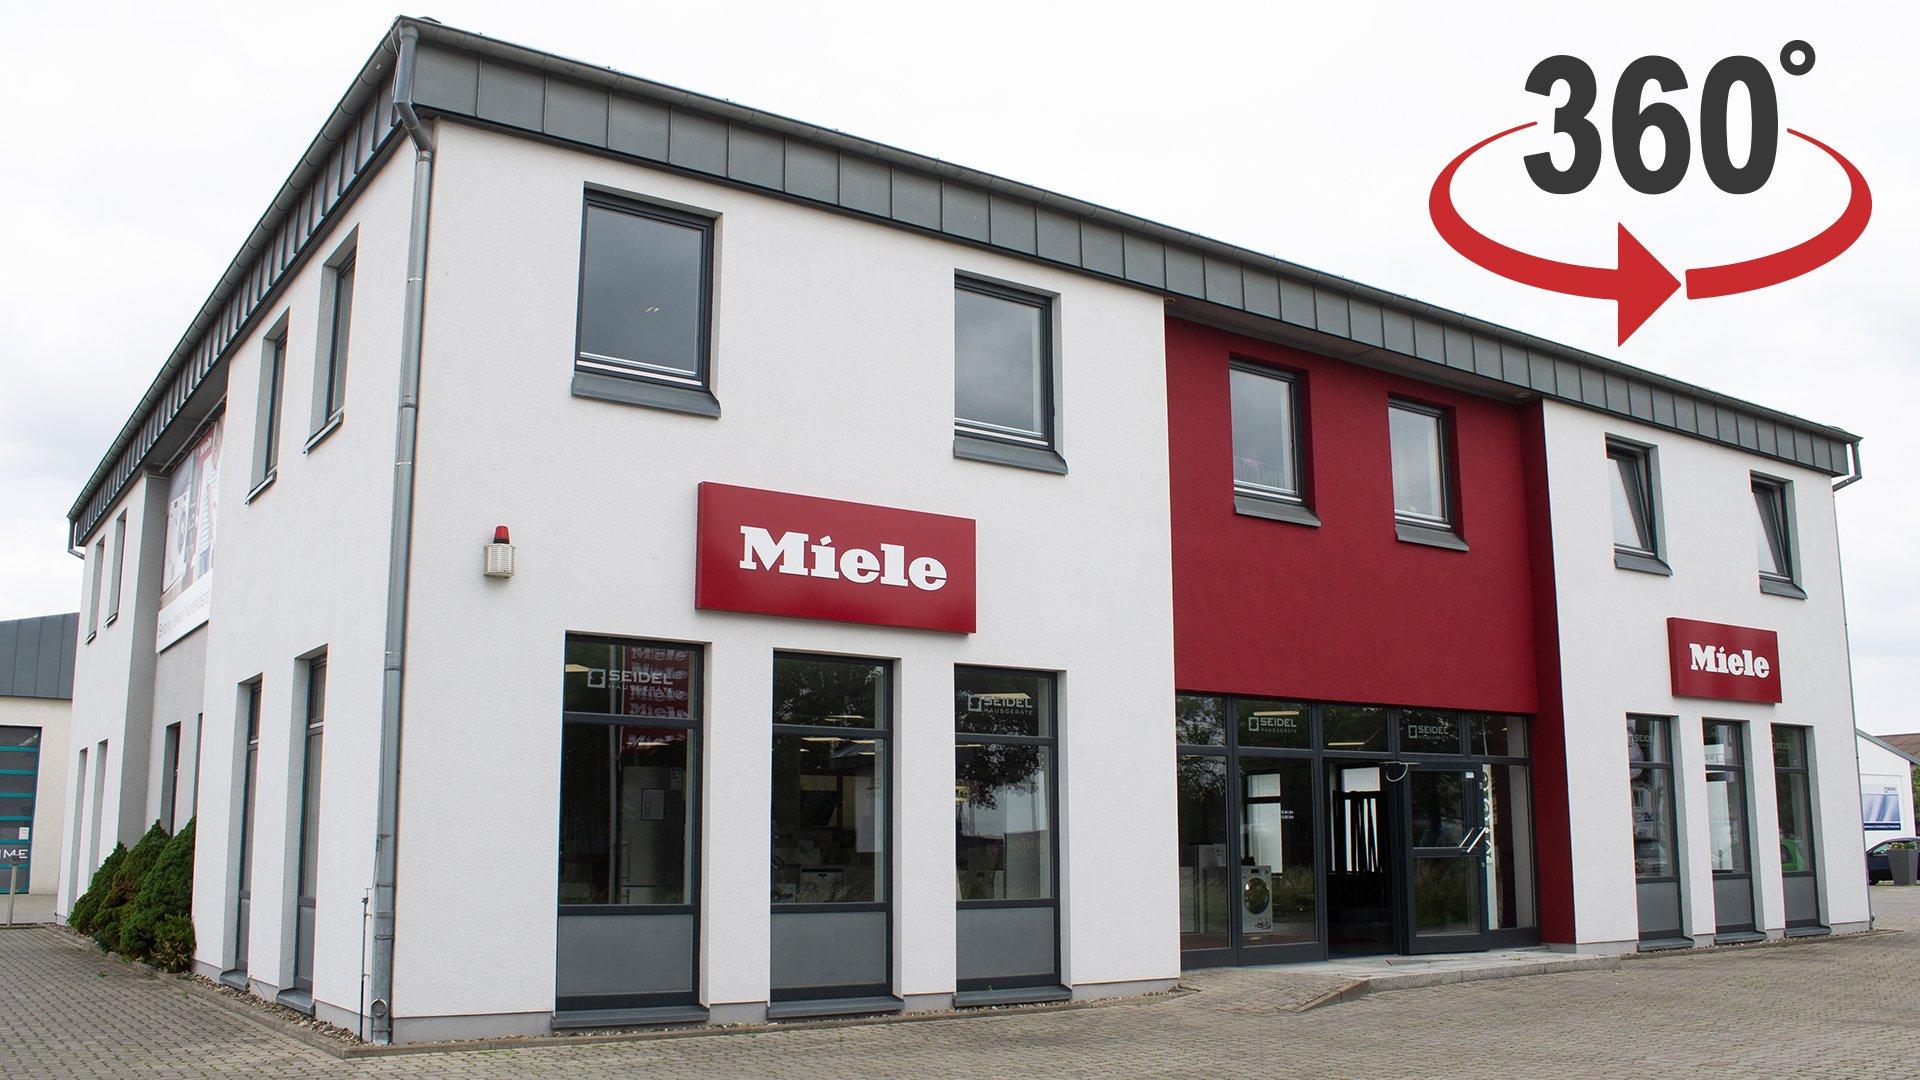 Seidel-Miele-Hannover-News-Beitragsbild-Miele-virtuell-erleben